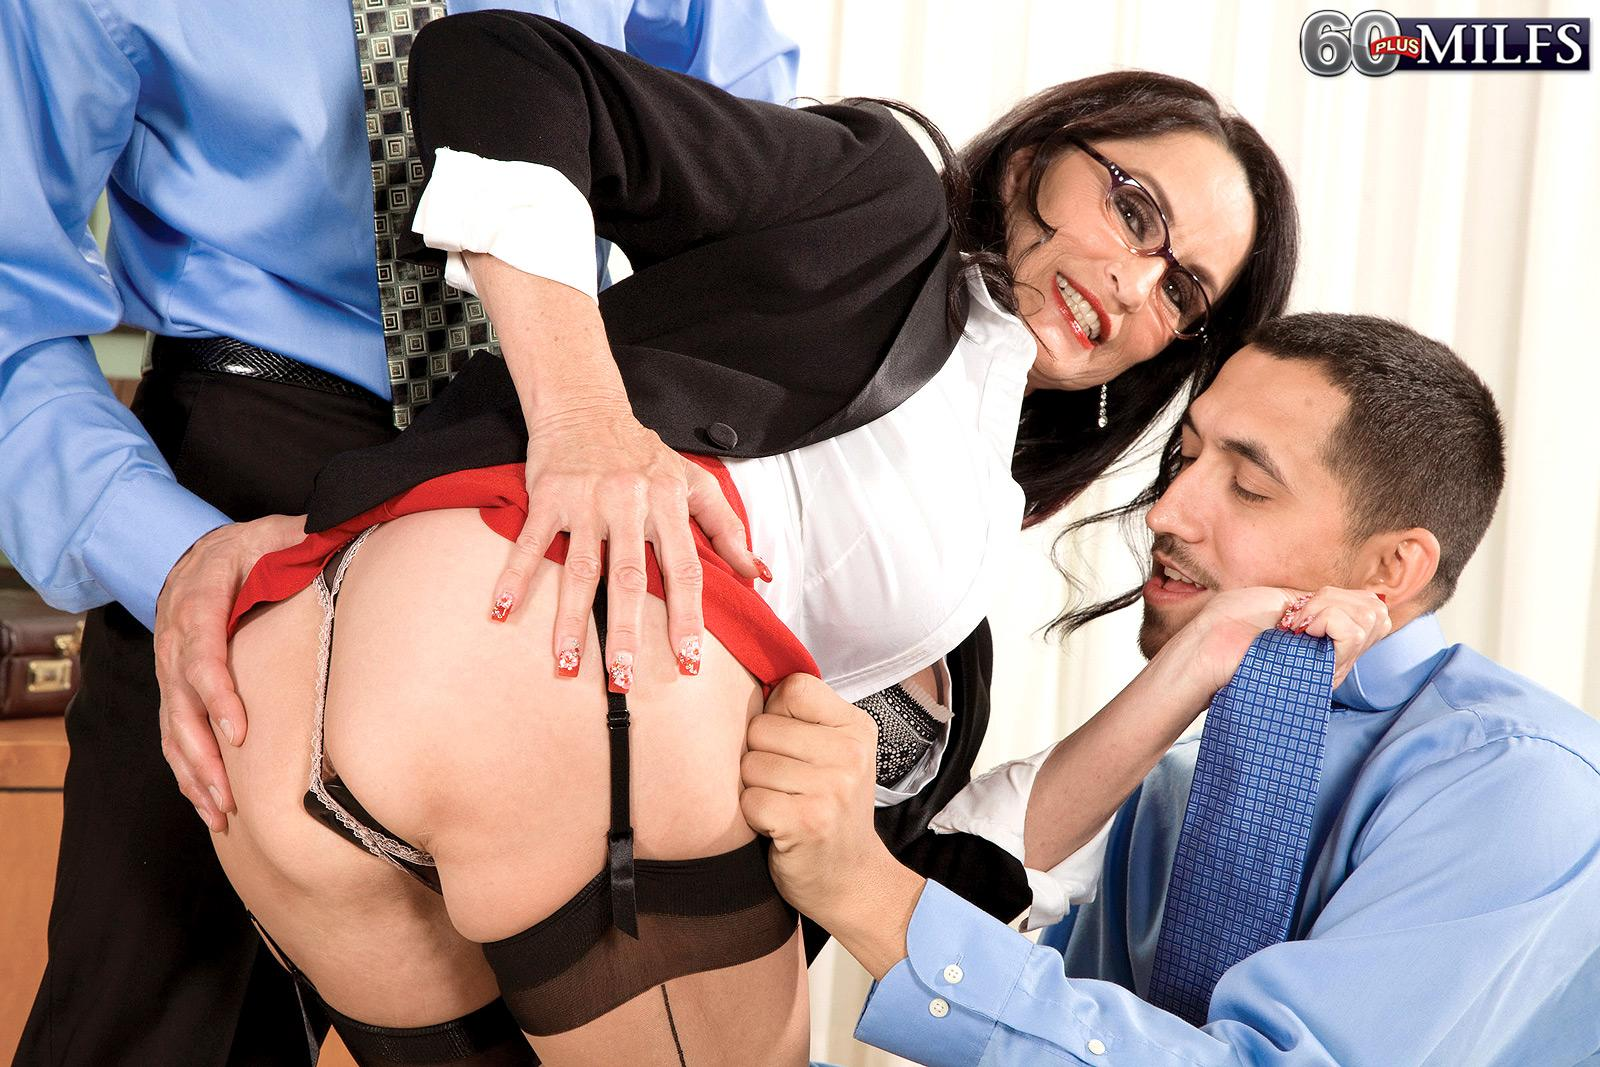 Leggy brunette Rita Daniels displaying mature upskirt panties before MMF threeway